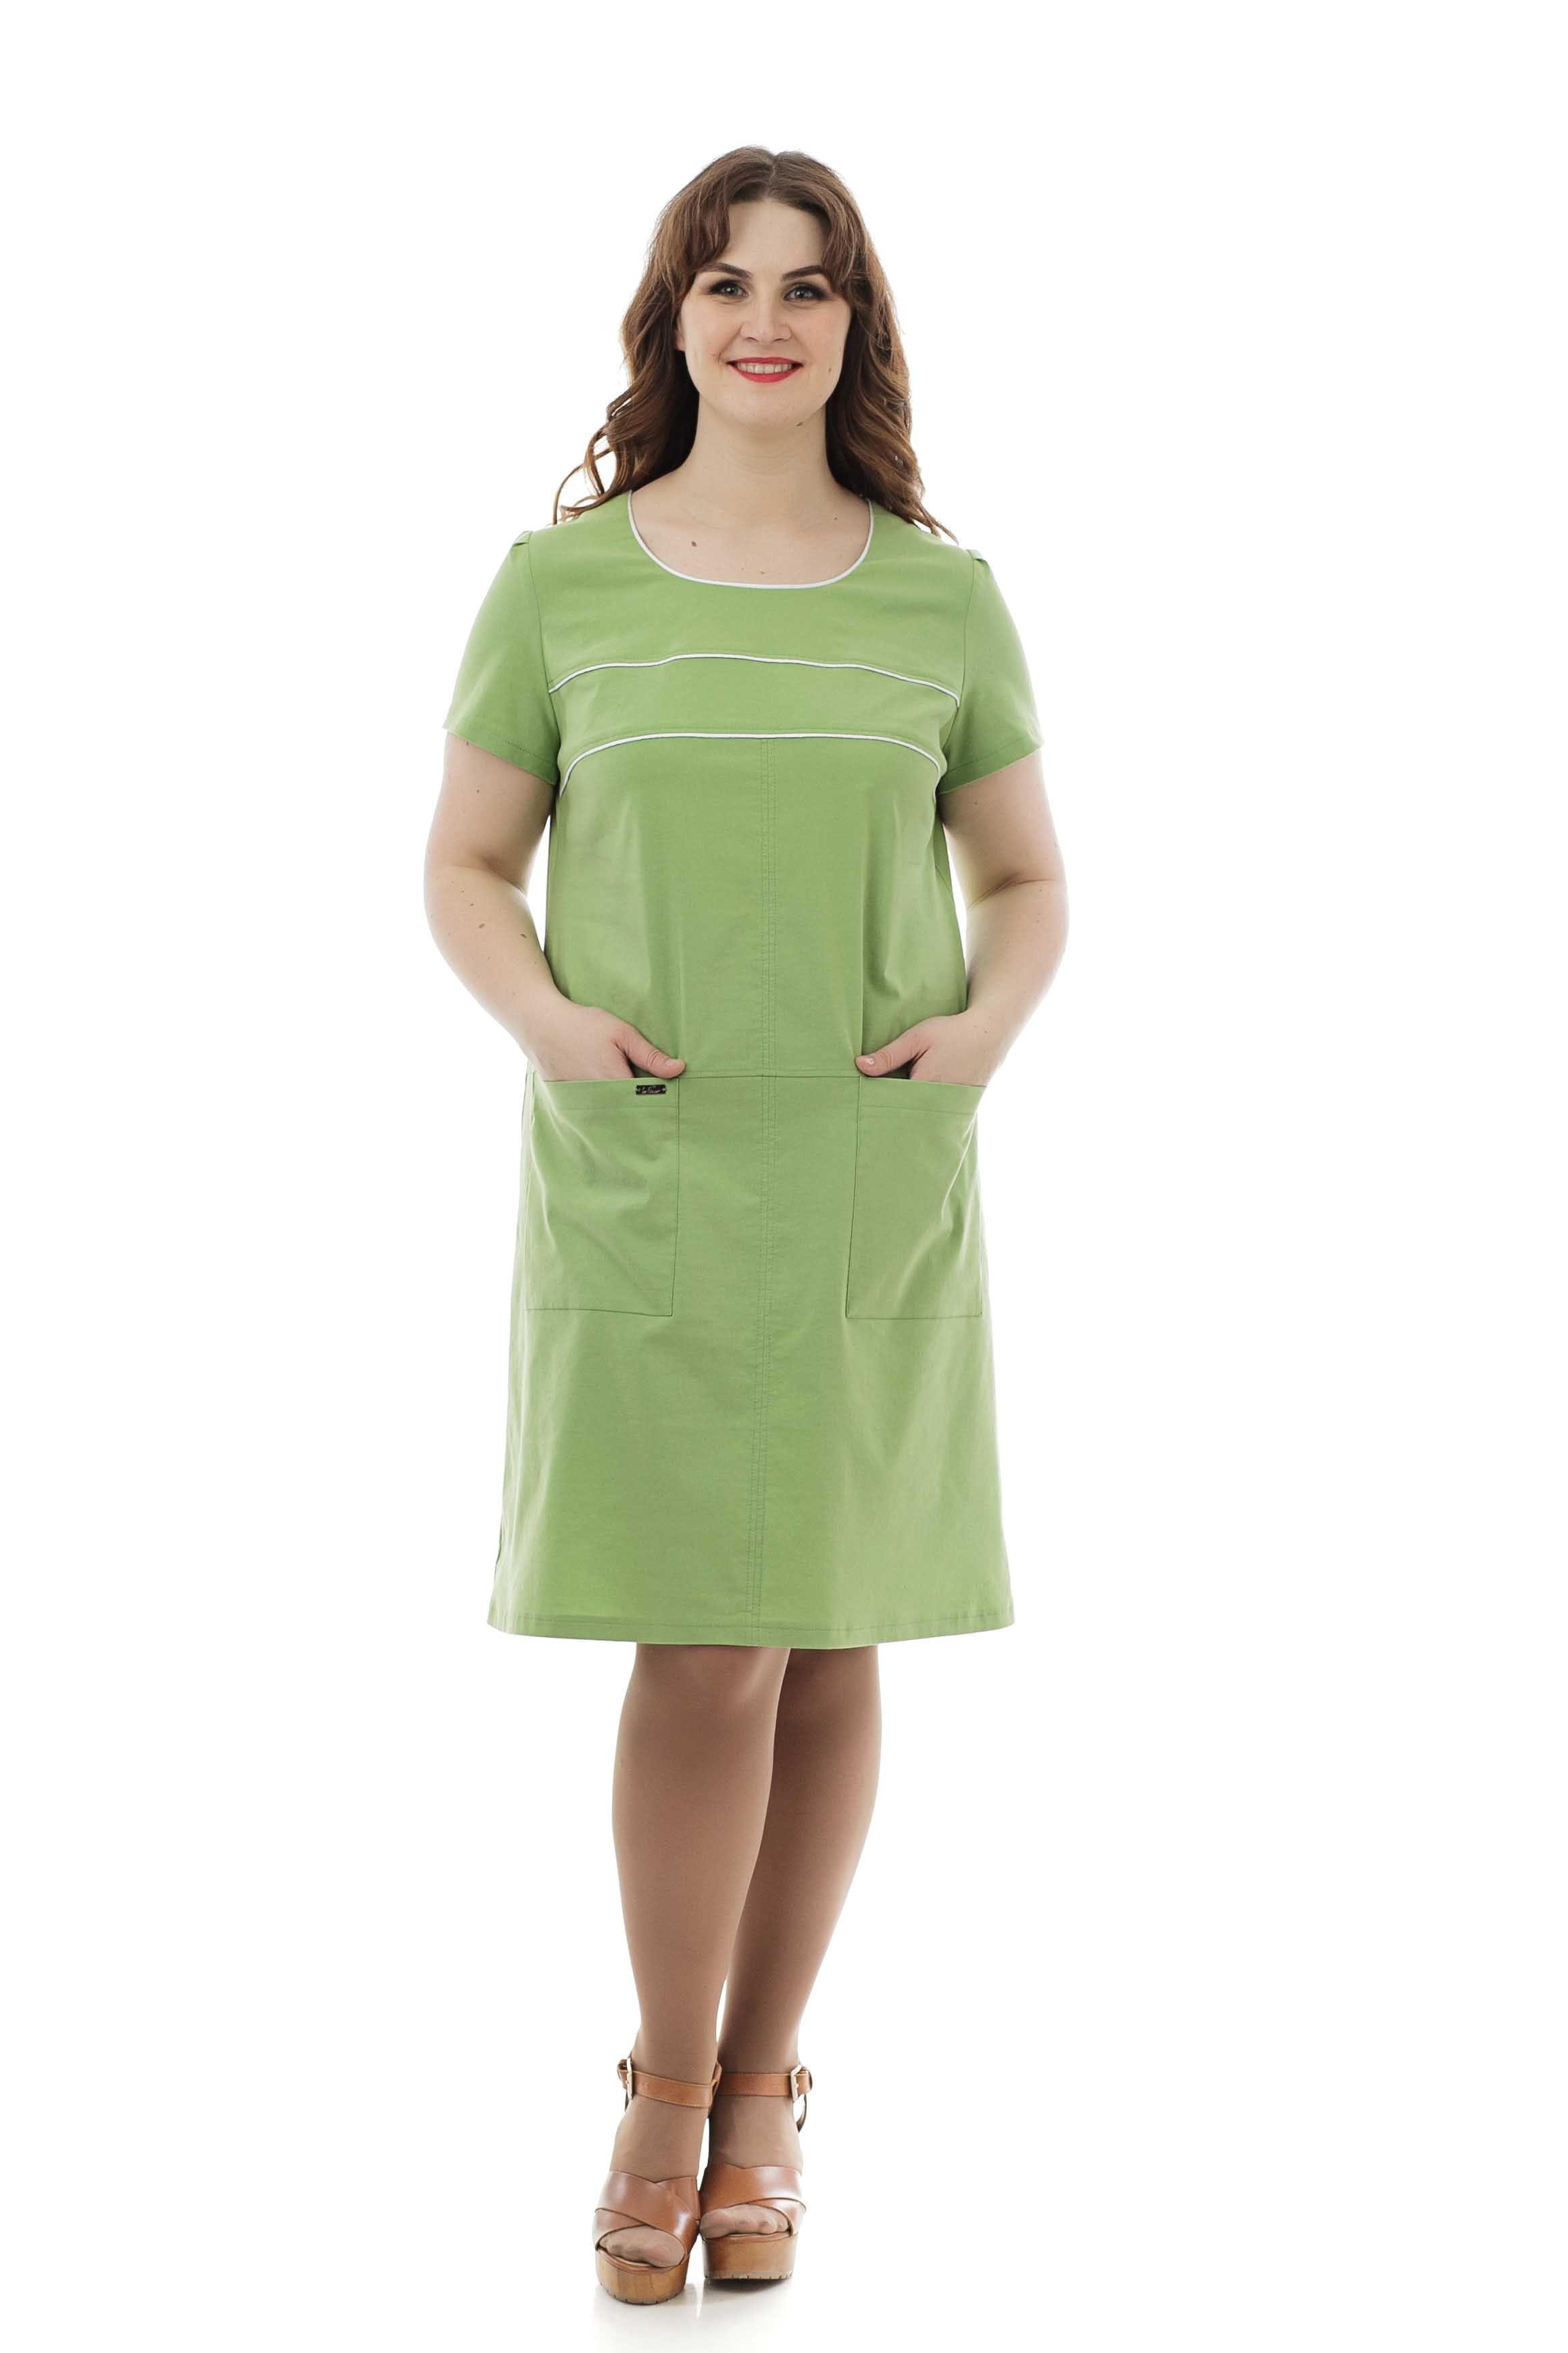 ПЛ-252/3 арт.18-089 (48-60) зеленый